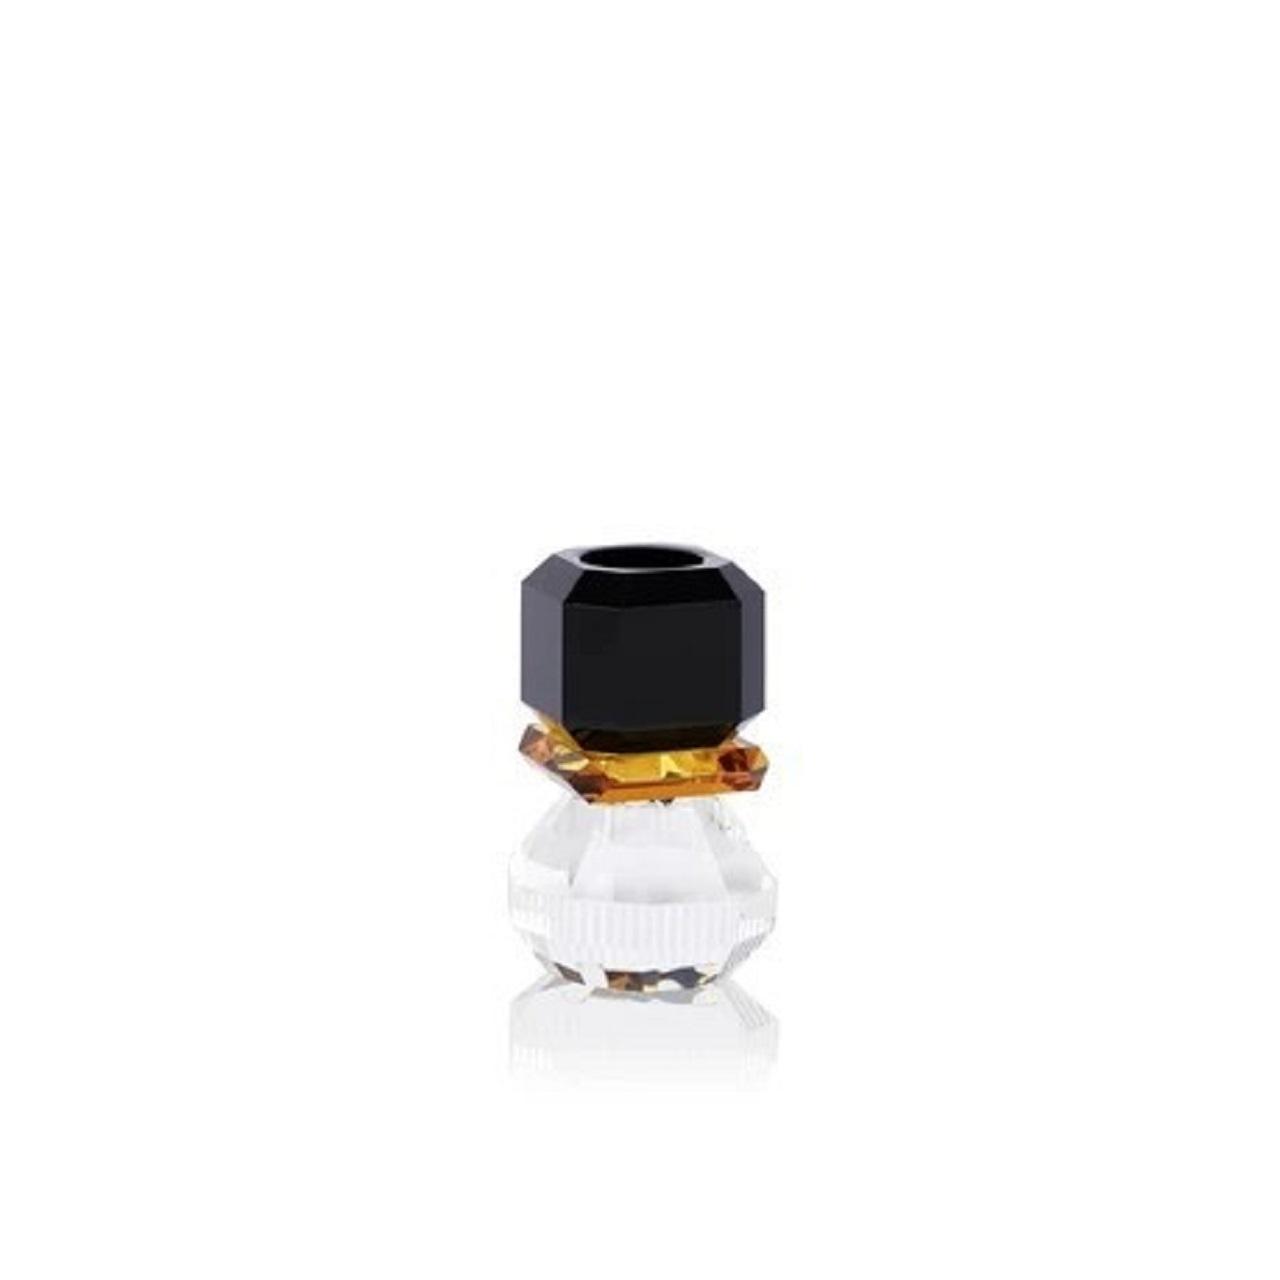 Suporte T-Light Phoenix | cristal ambar e preto